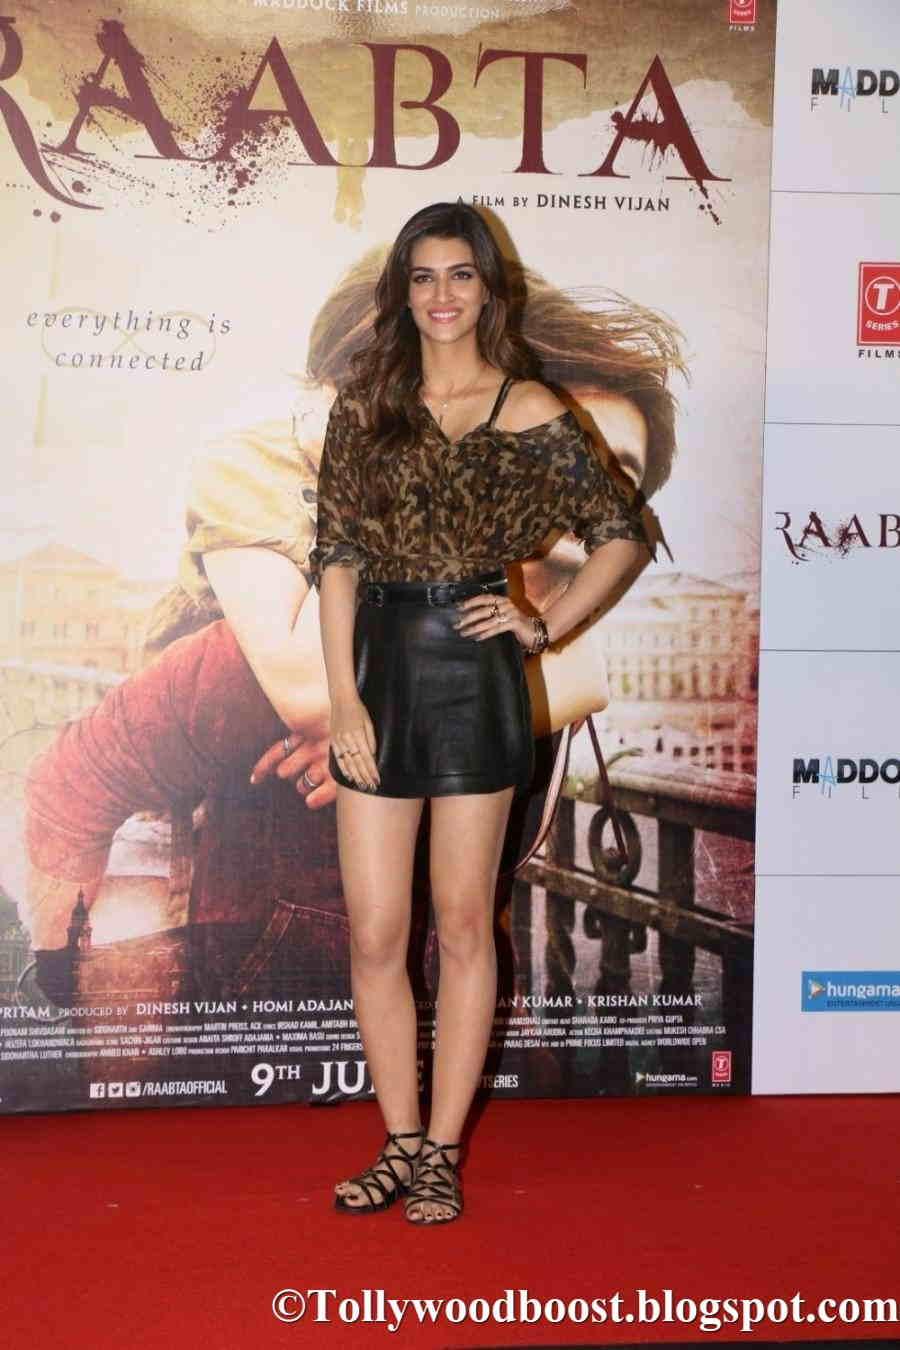 Kriti Sanon Long Legs Thighs Show In Black Mini Dress